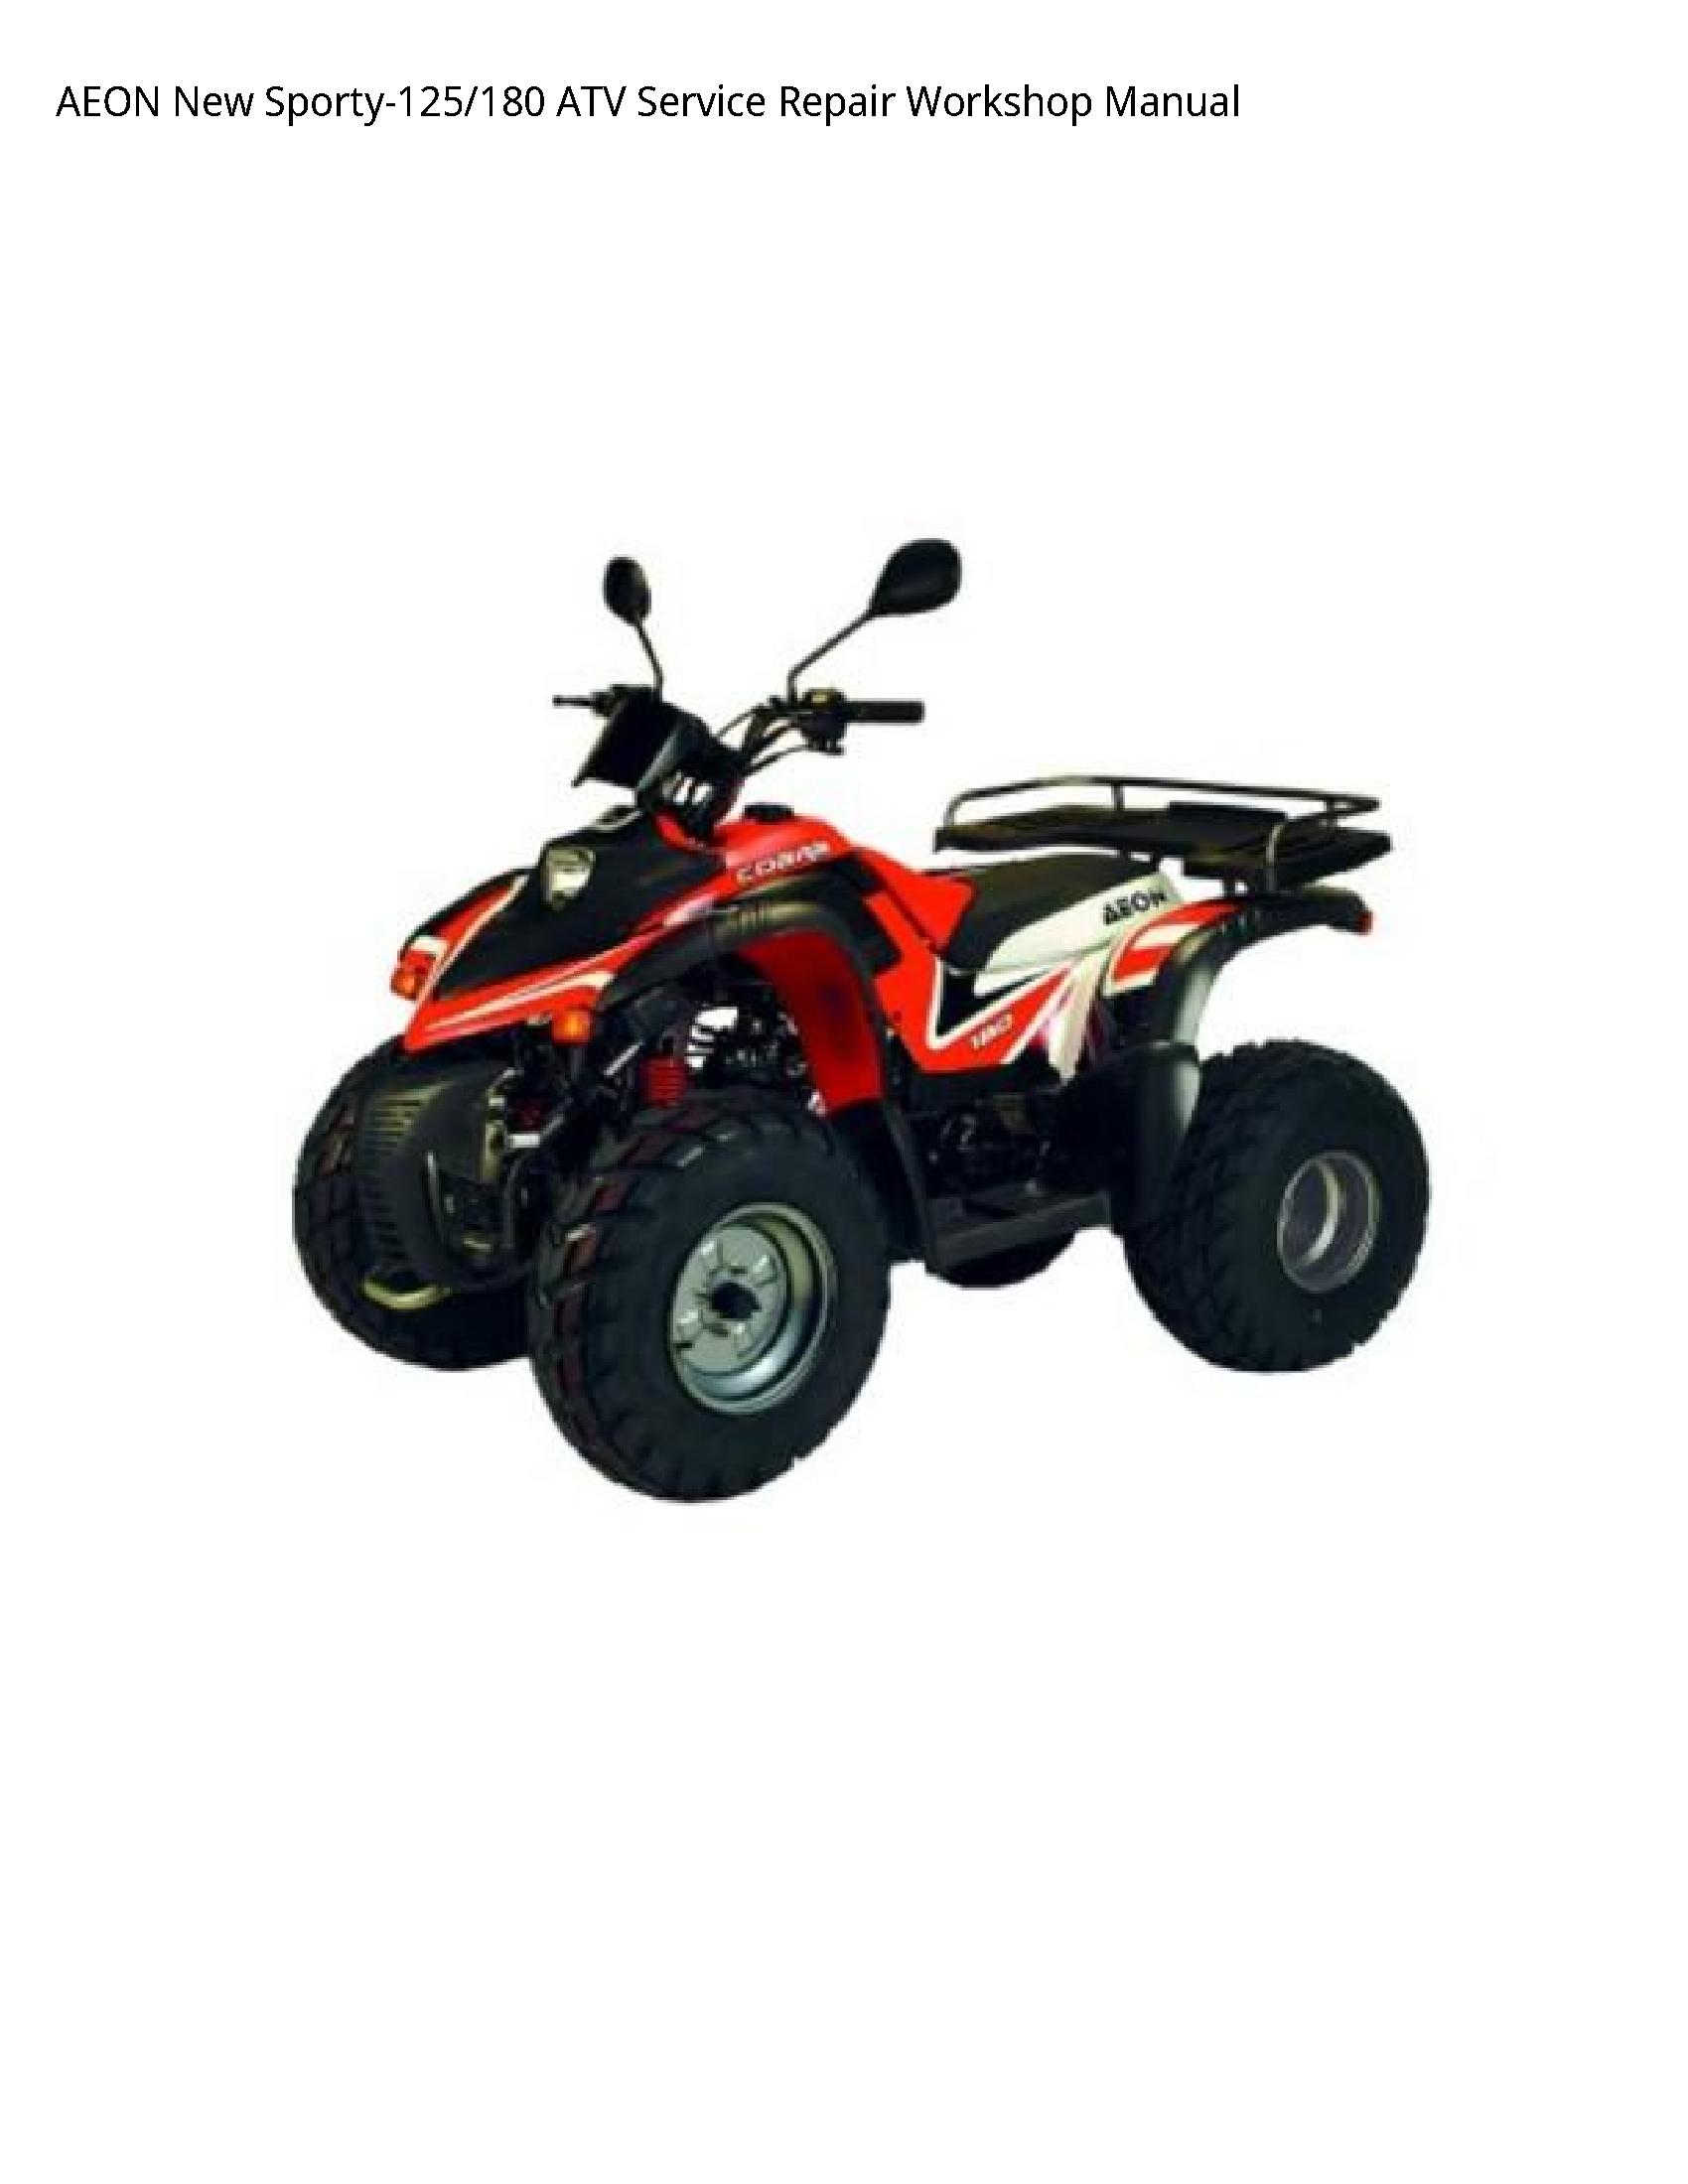 AEON Sporty-125 New ATV manual